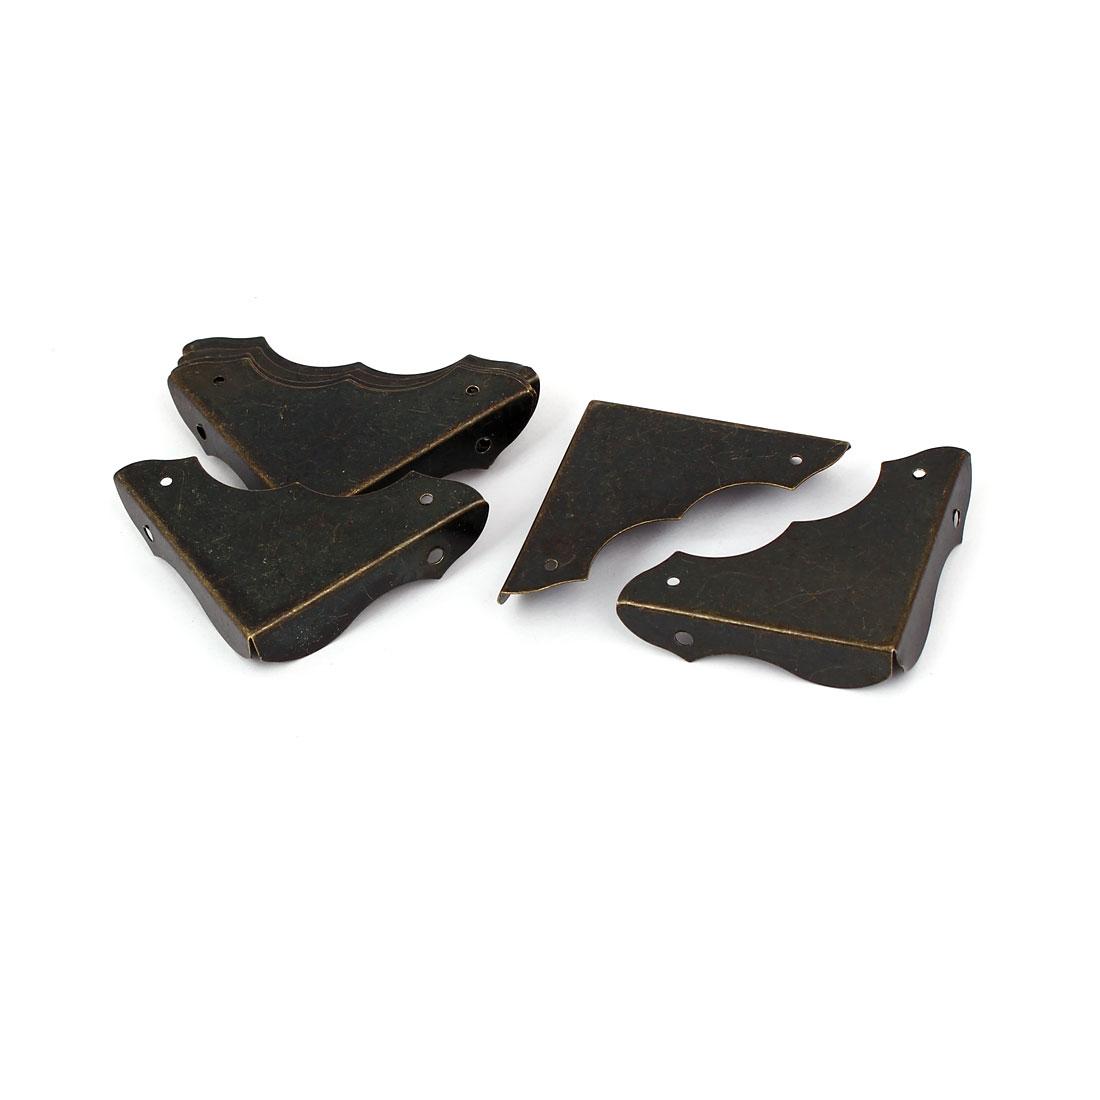 Chest Wine Case Wooden Box 40mm x 9mm Feet Leg Corner Protector 8PCS w Screws